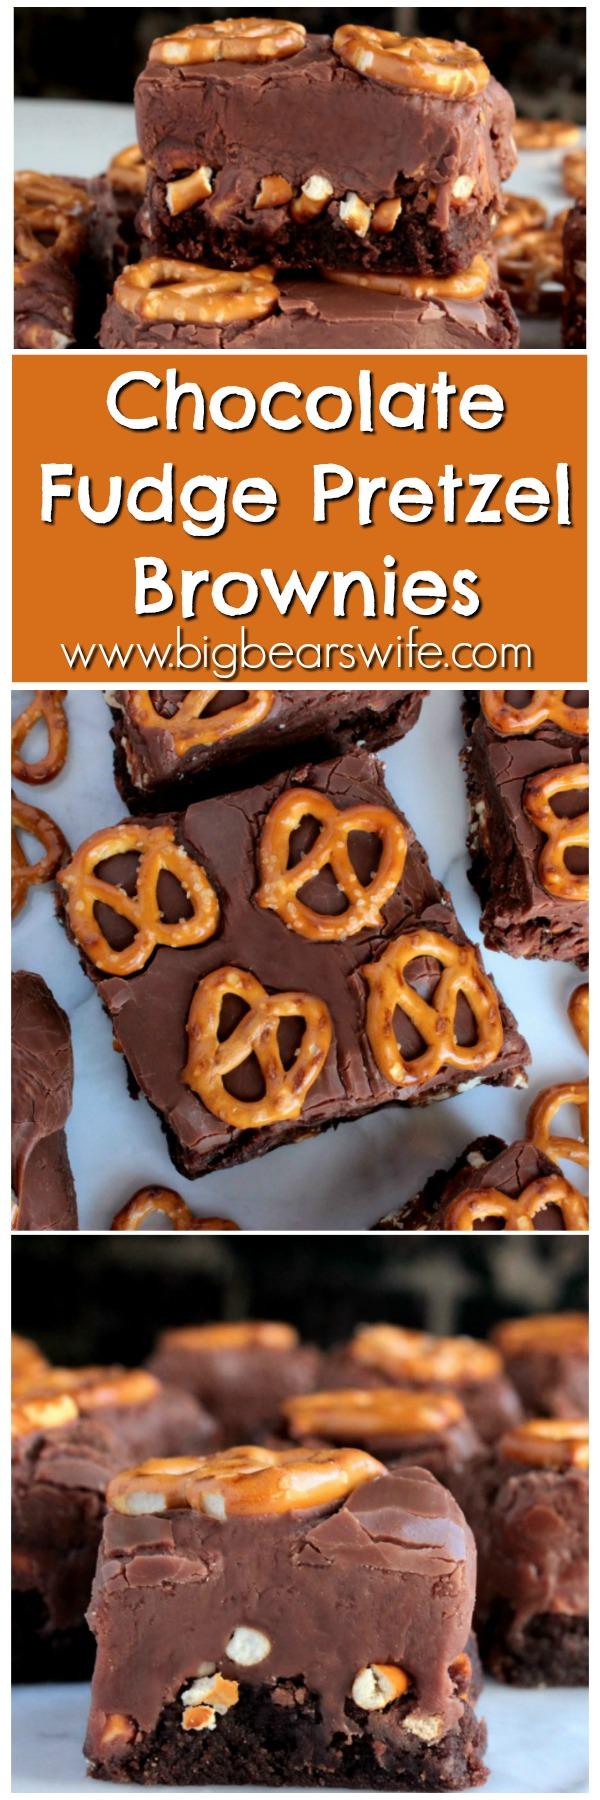 Chocolate Fudge Pretzel Brownies